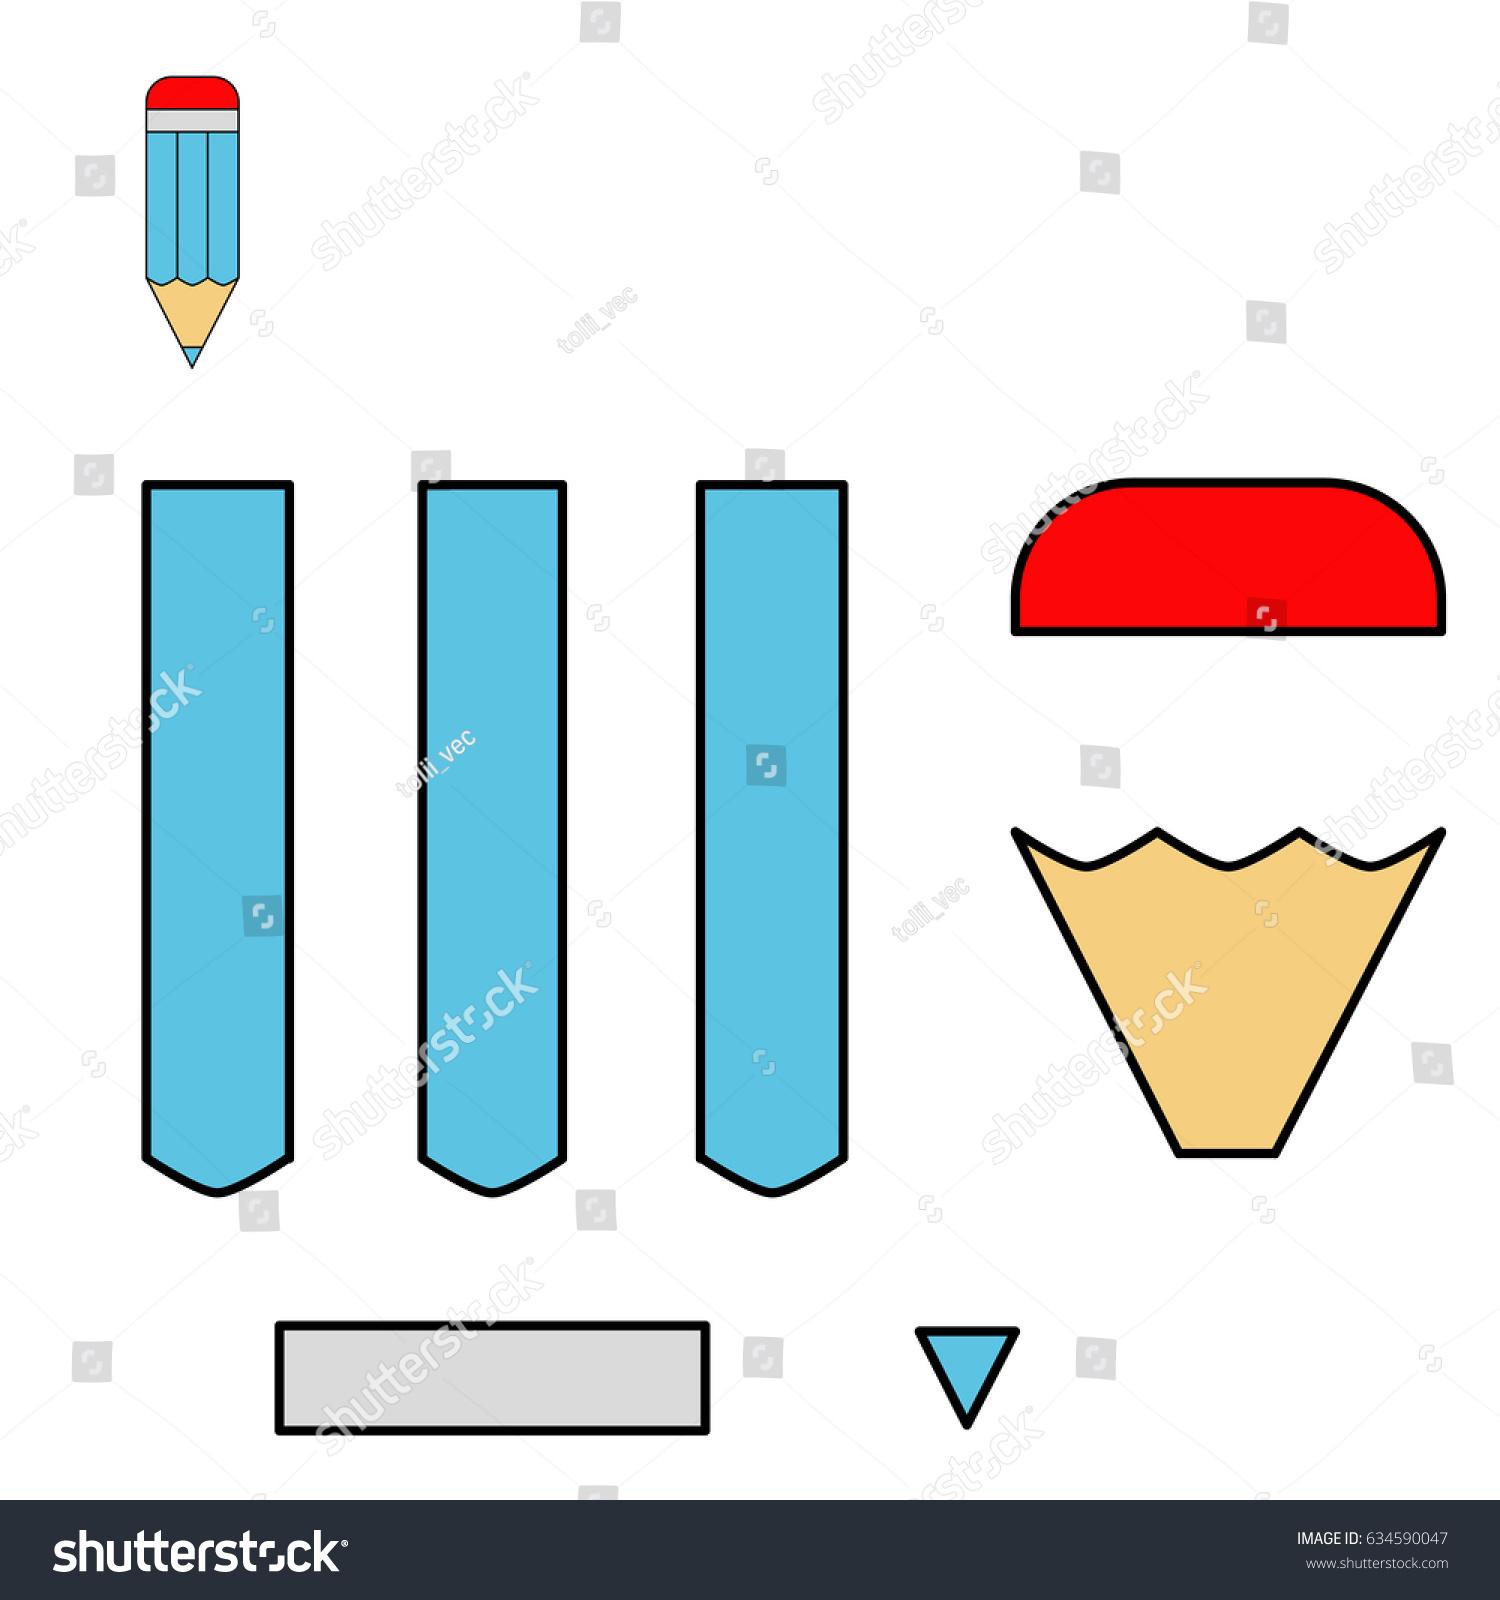 Cut Glue Vector Game Children Worksheet Stock Vector (Royalty Free ...